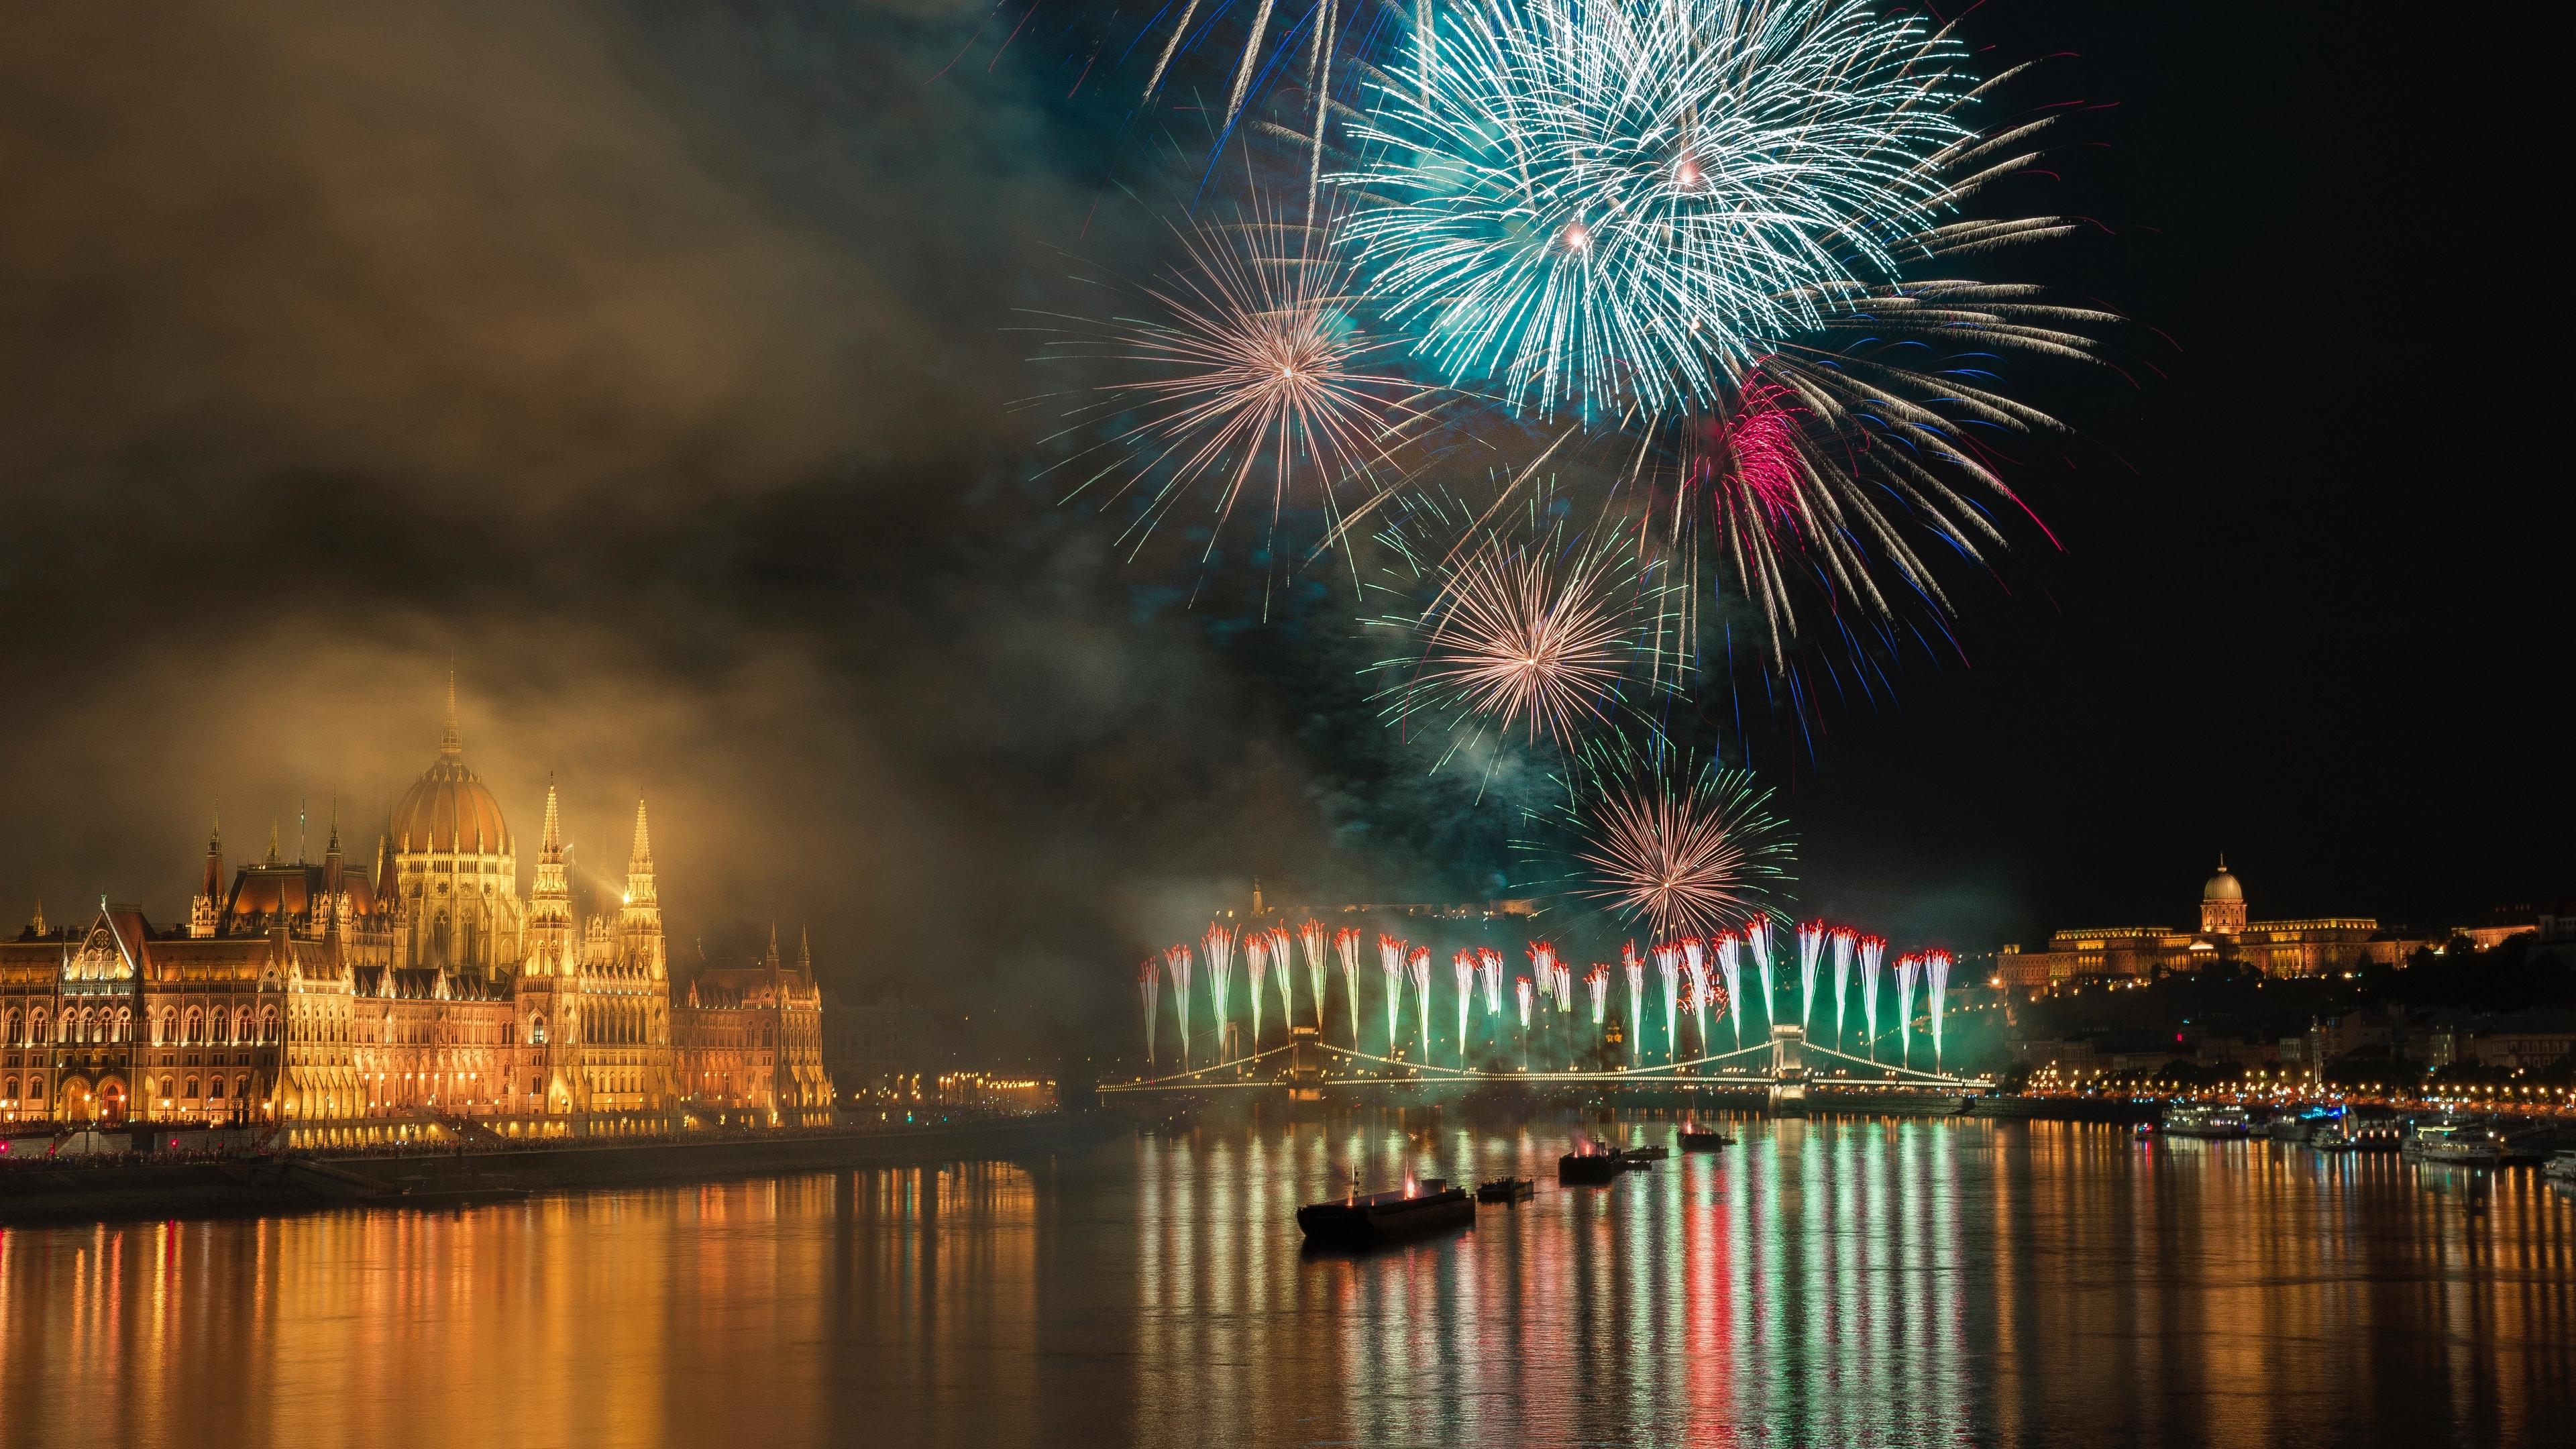 salute night city celebration budapest hungary night 4k 1538066400 - salute, night city, celebration, budapest, hungary, night 4k - salute, night city, Celebration